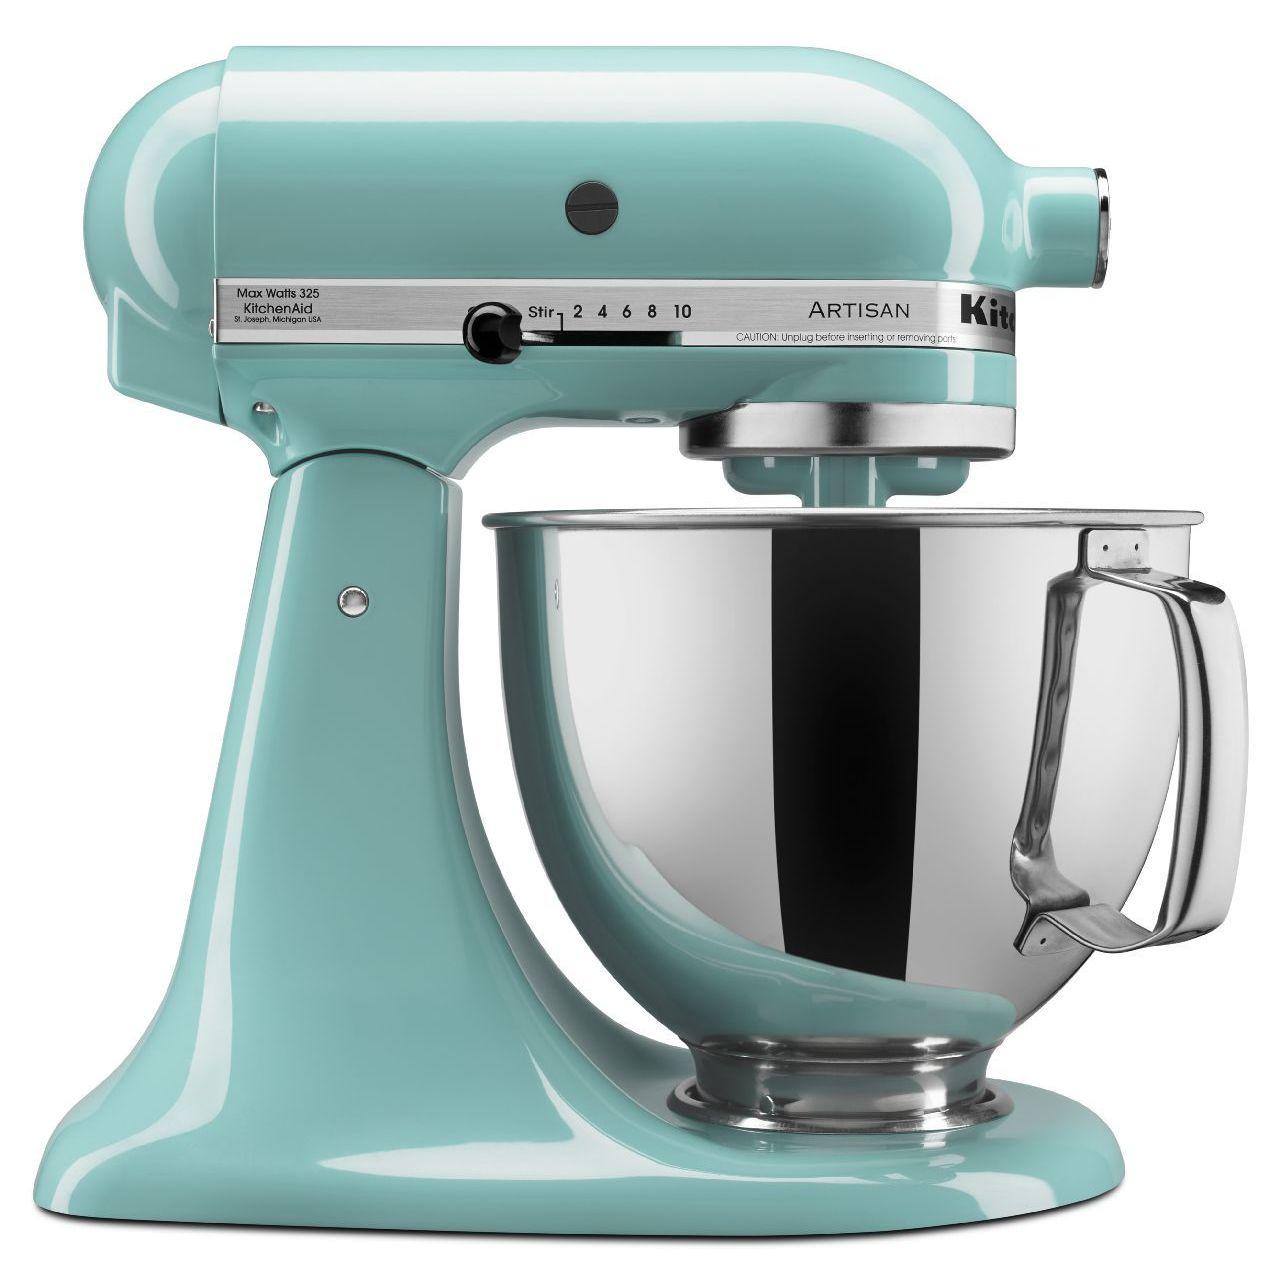 Shop KitchenAid KSM150PS 5-Quart Artisan Tilt-Head Stand Mixer - Free Shipping Today - Overstock.com - 4838522